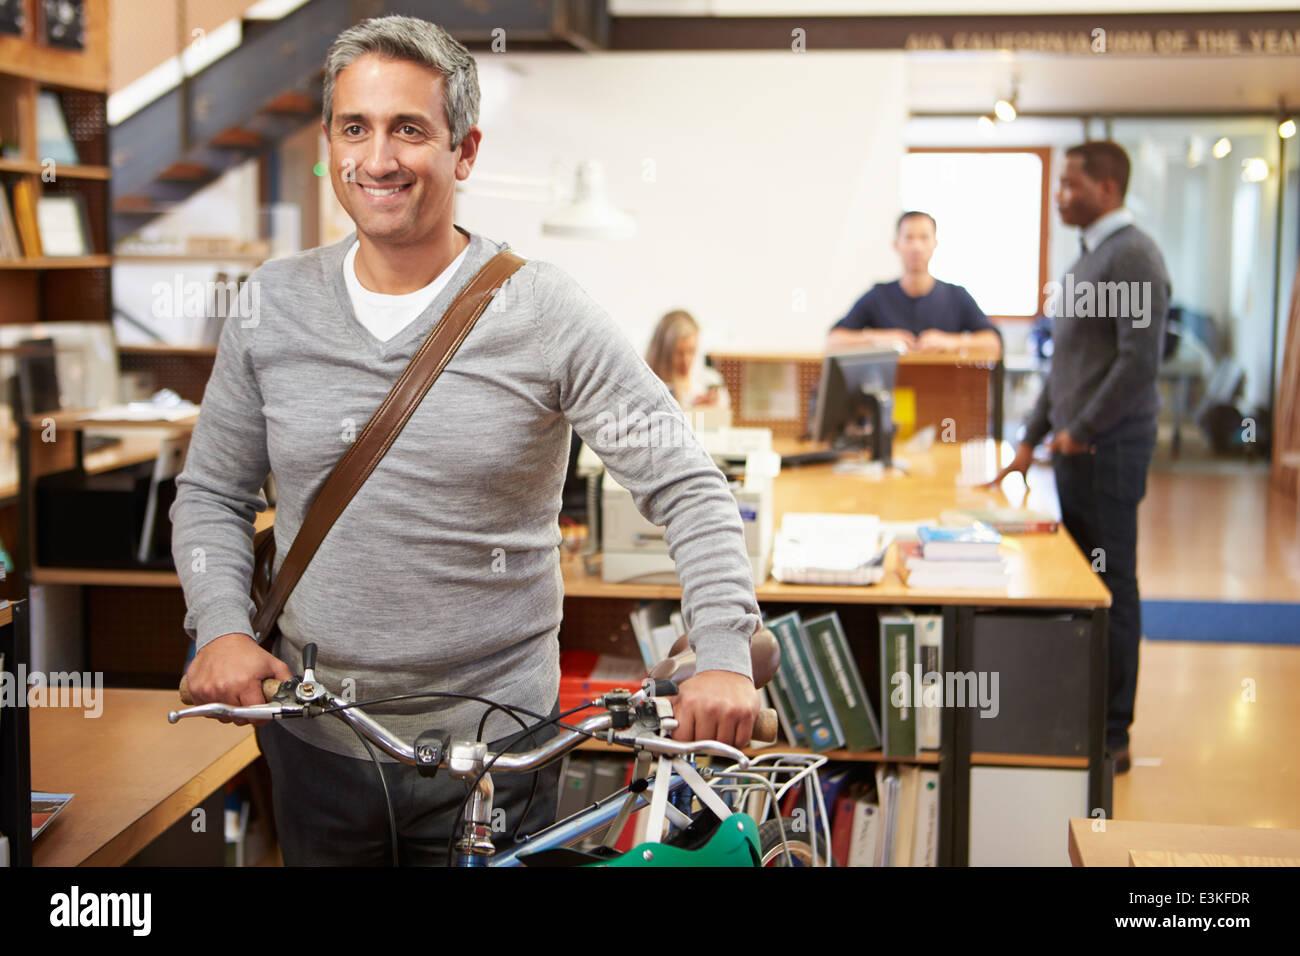 Architect Arrives At Work On Bike Pushing It Through Office - Stock Image